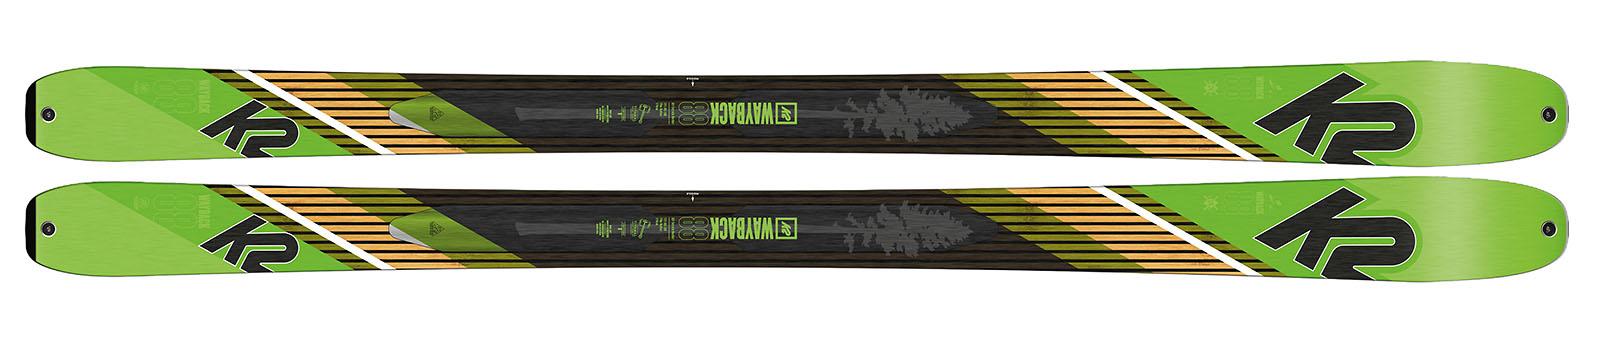 K2 Waybavk 88